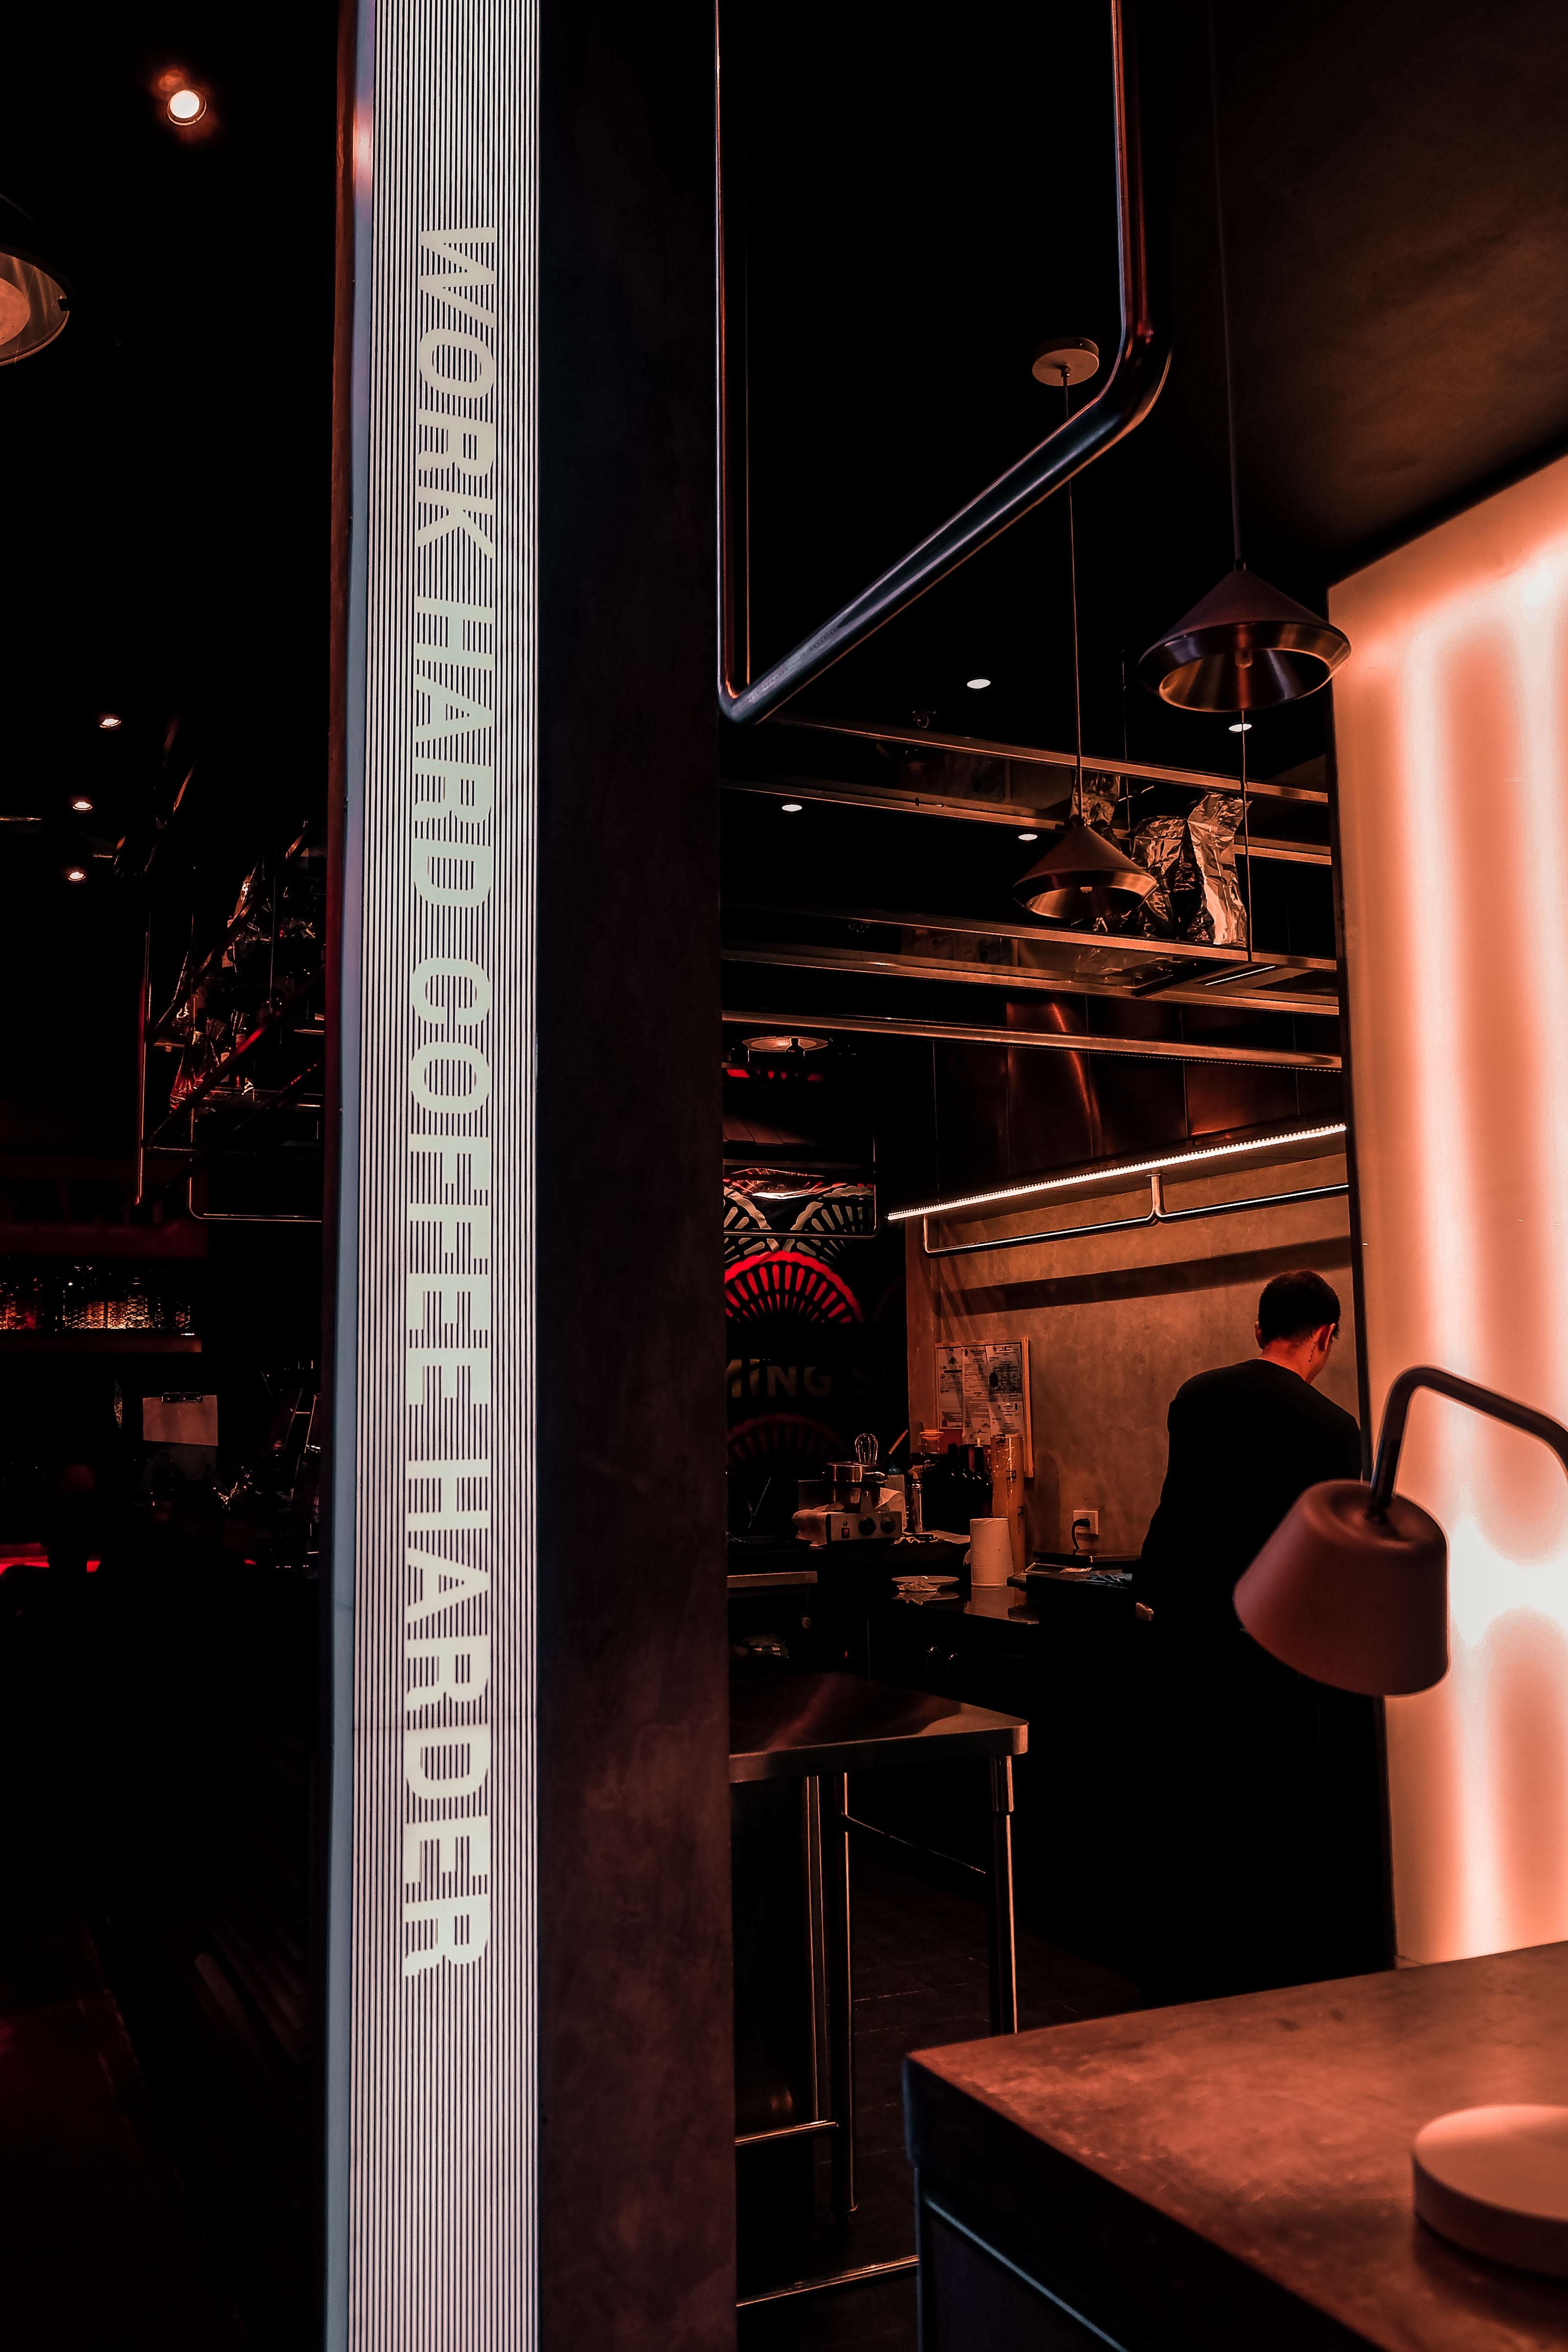 work hard coffee harder signage near man standing inside the bar